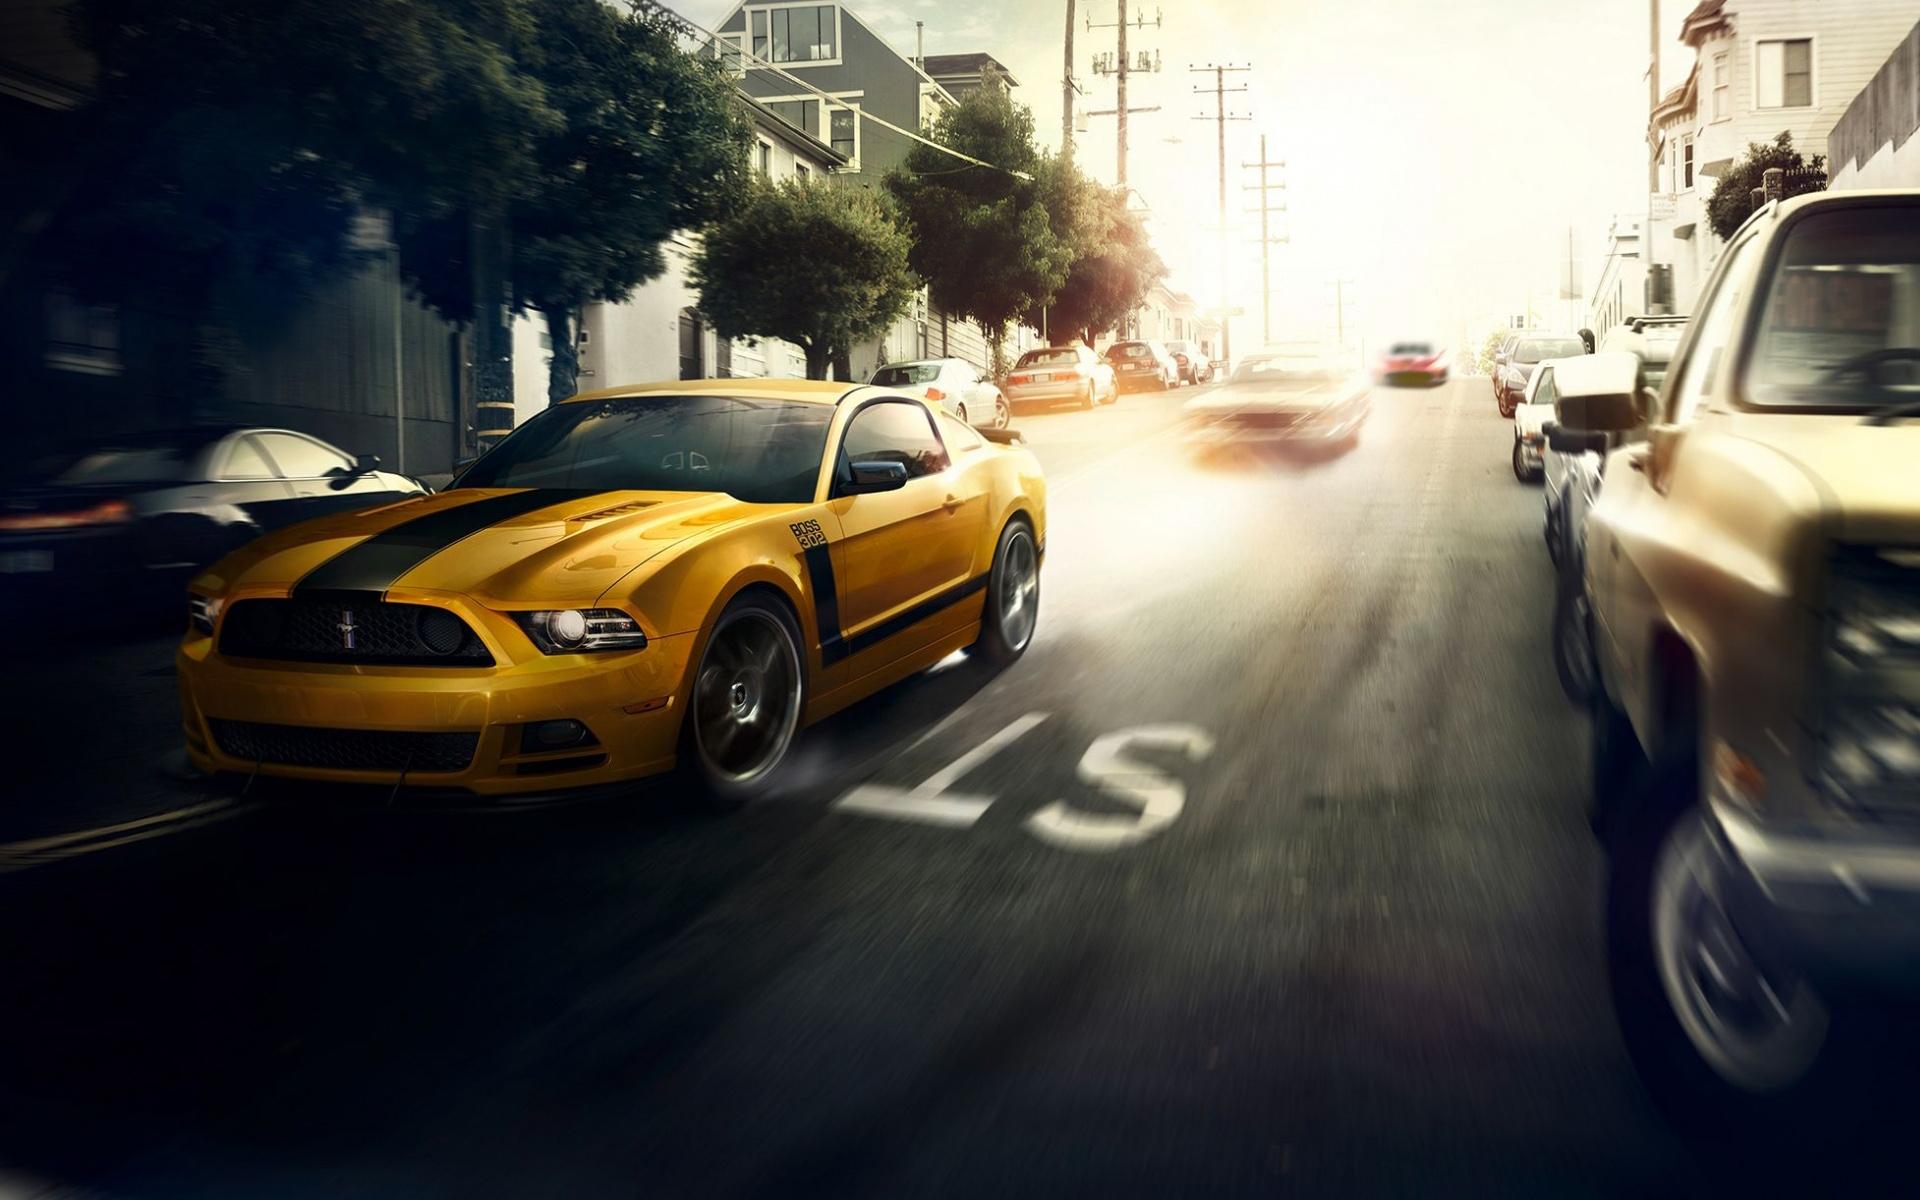 Ford Mustang Boss 302 Wallpaper HD Car Wallpapers